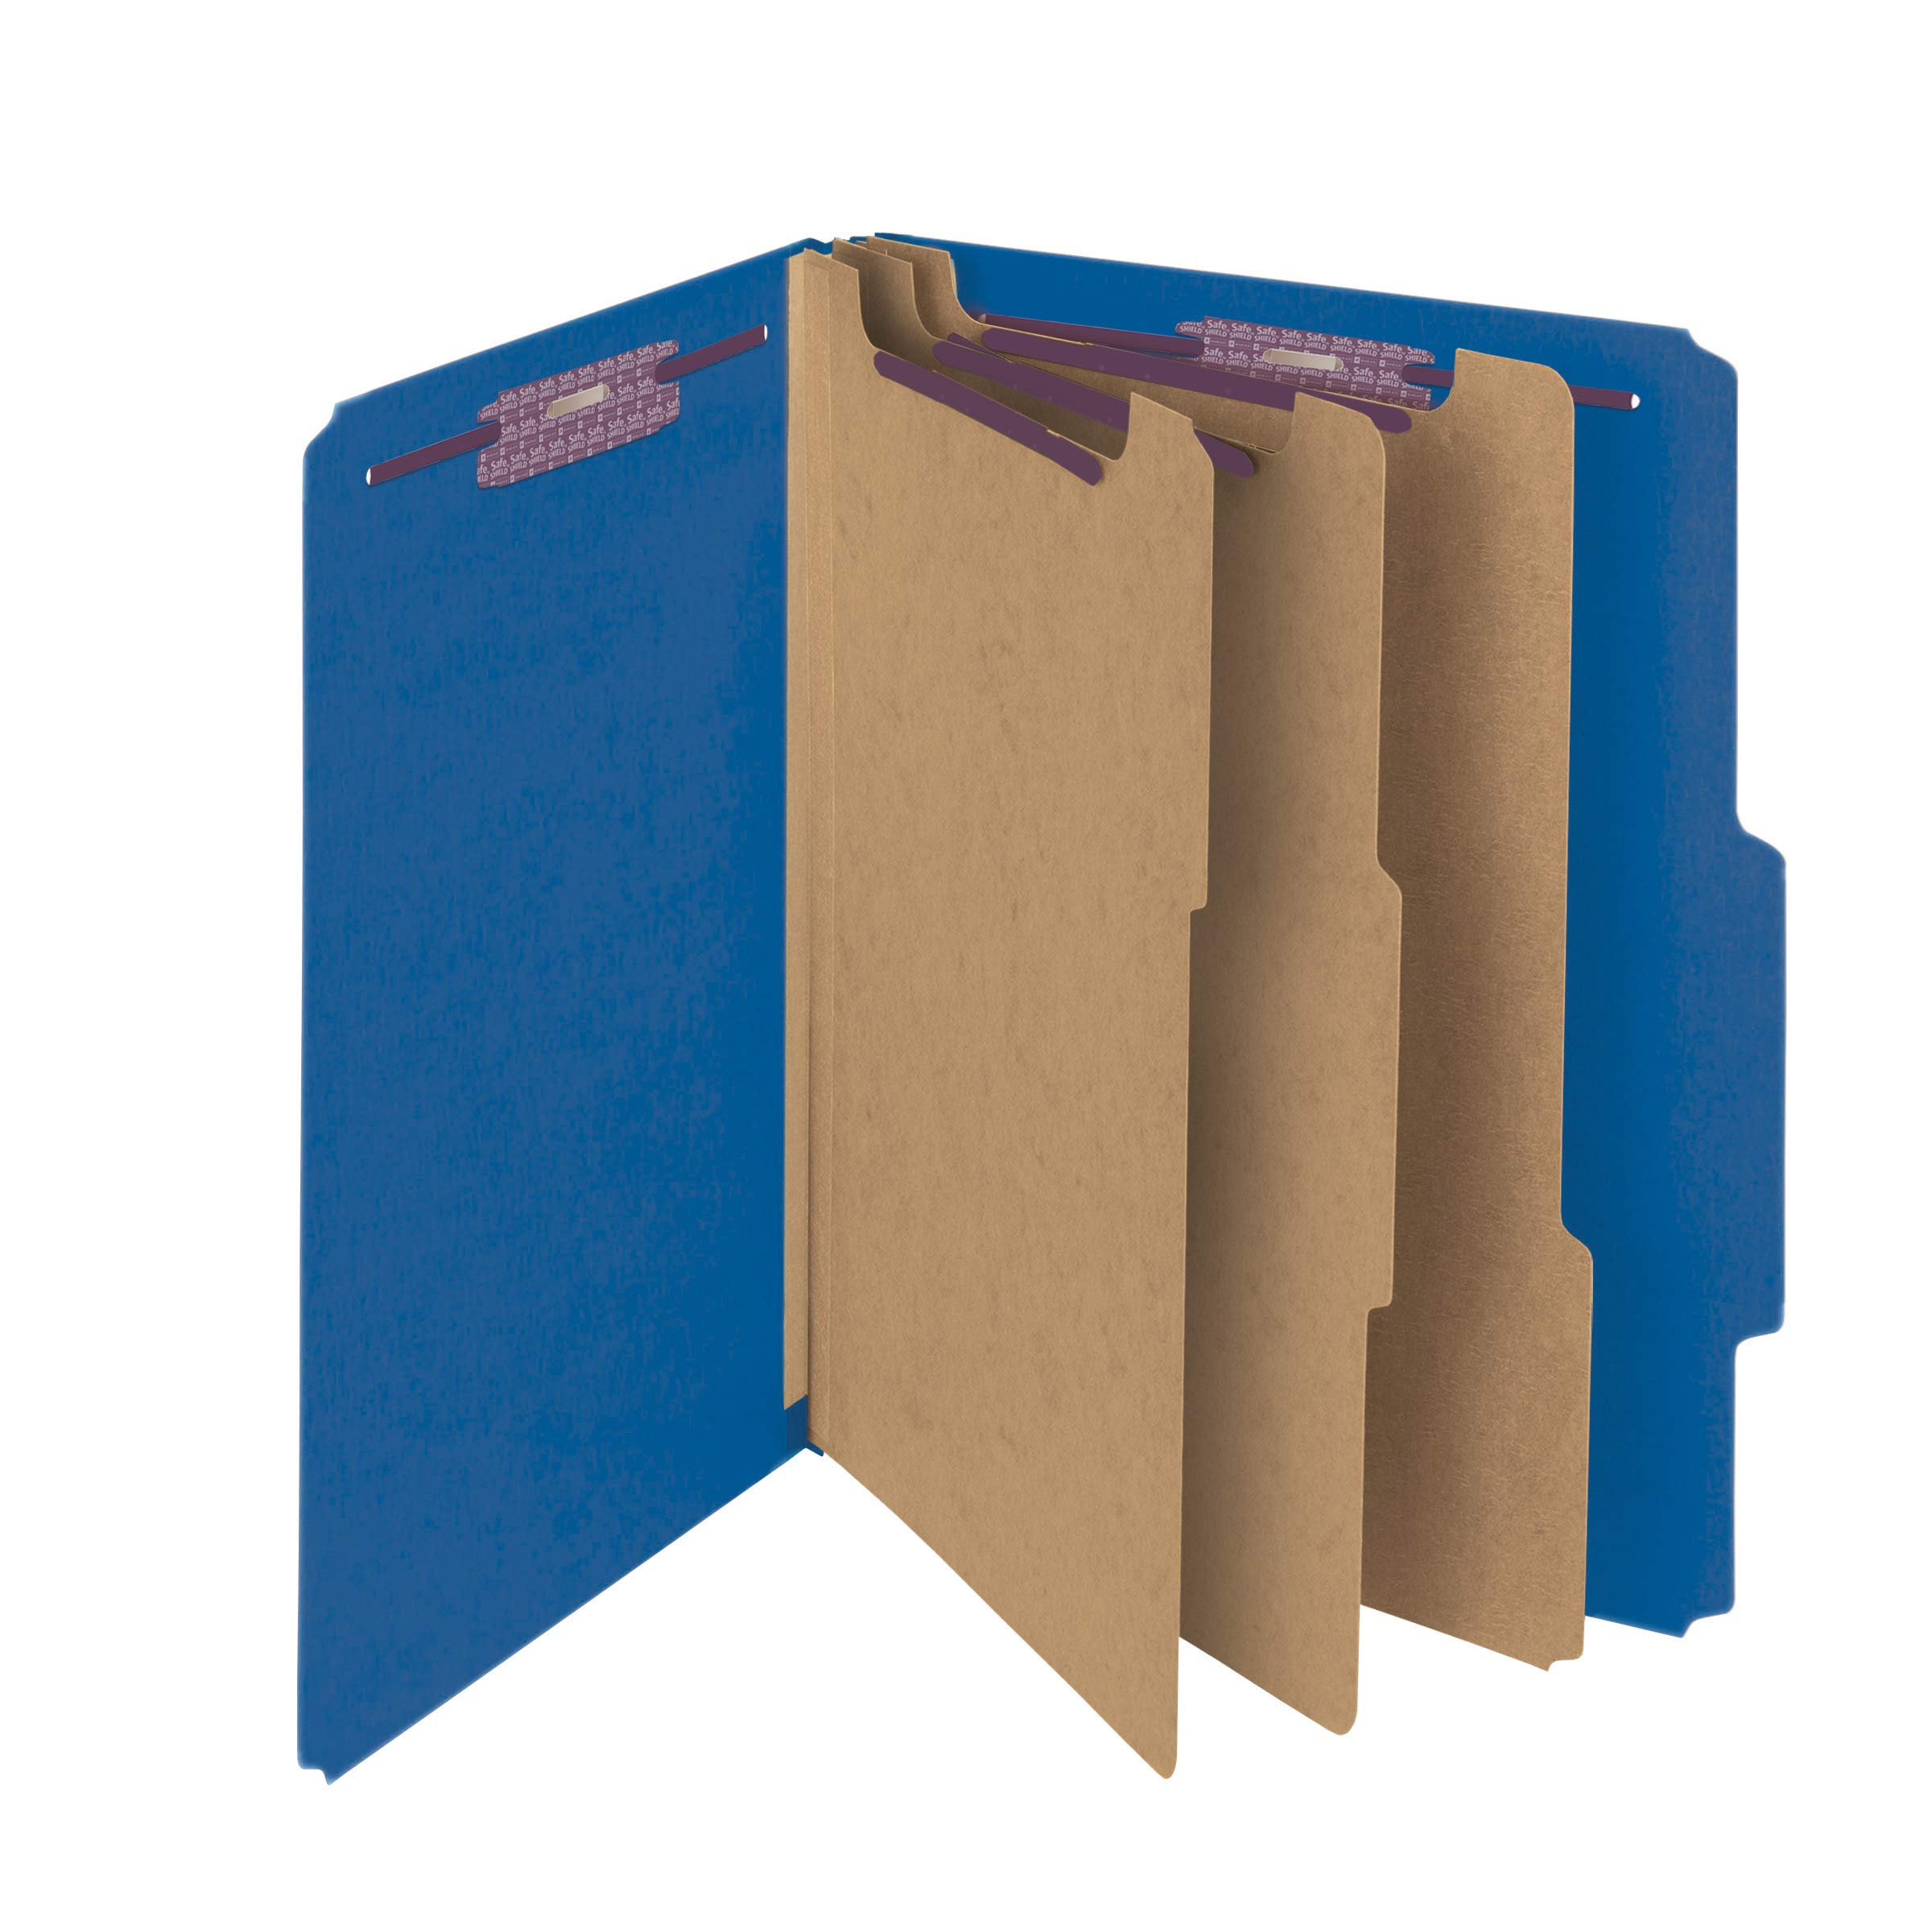 Smead Pressboard Classification File Folder with SafeSHIELD Fasteners, 3 Dividers, 3'' Expansion, Letter Size, Dark Blue, 10 per Box  (14096)